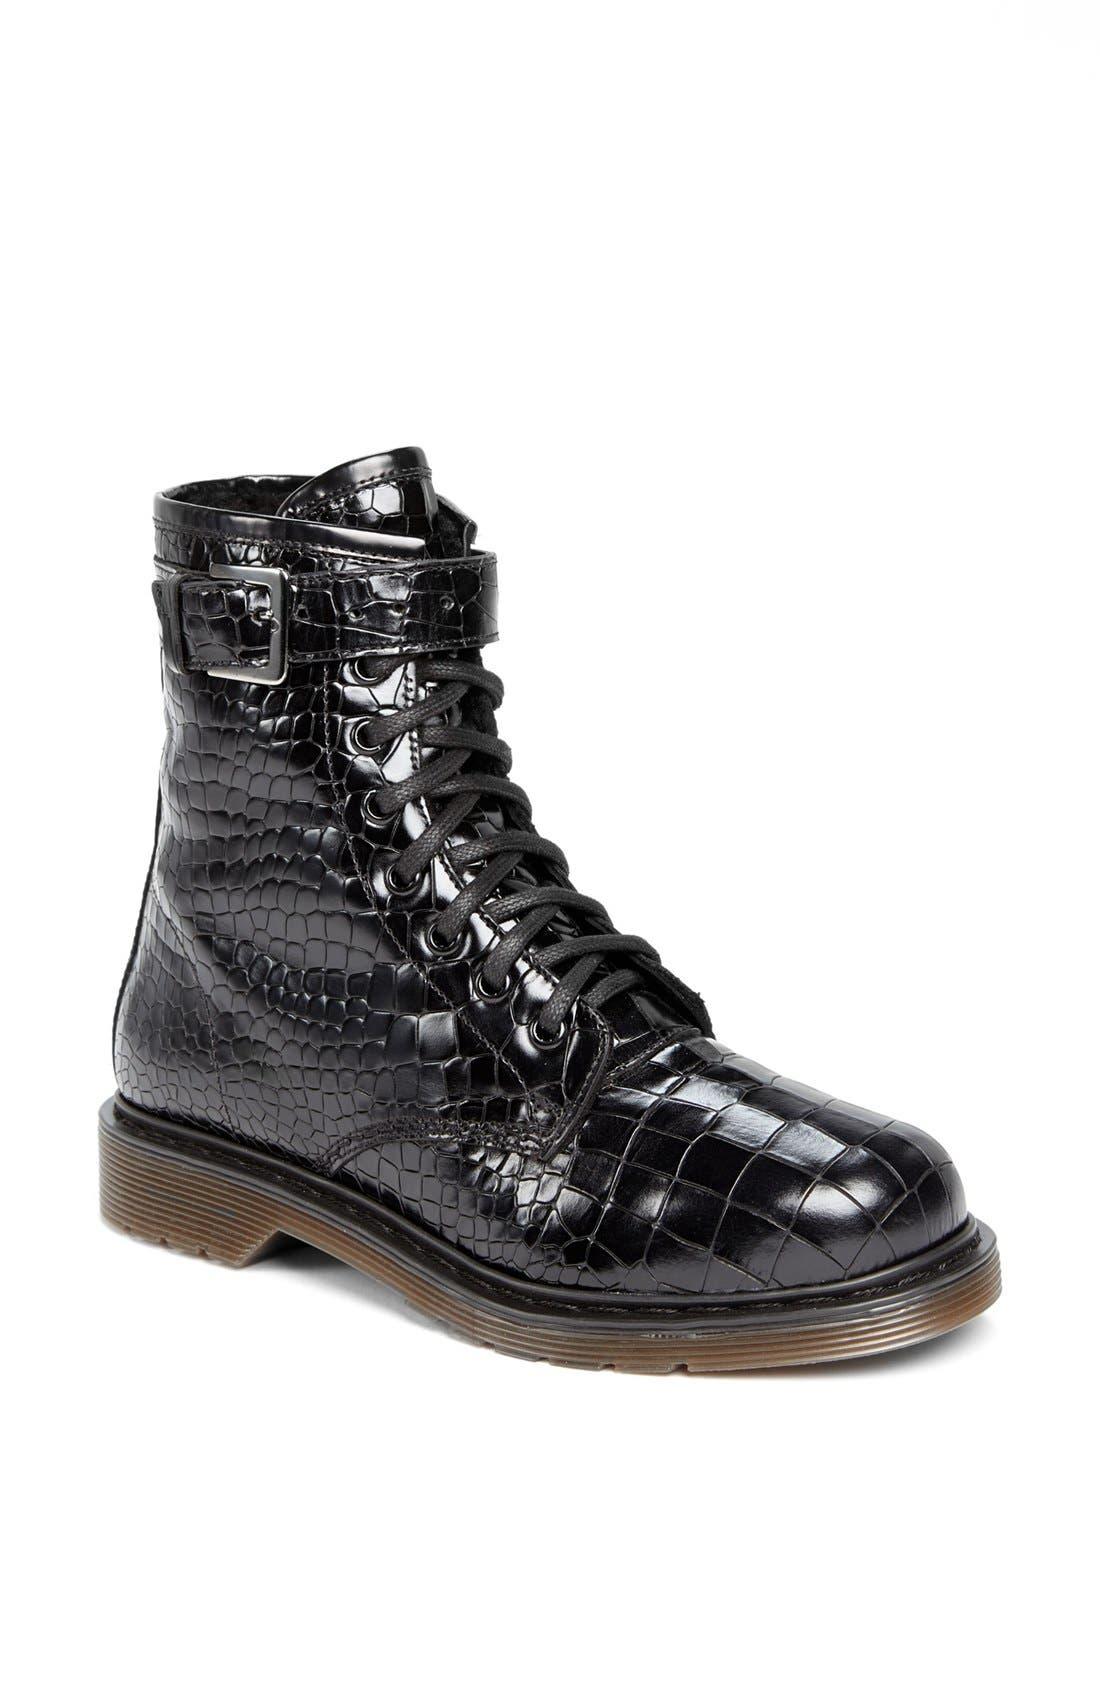 Main Image - Kurt Geiger London 'Steell' Croc Embossed Leather Boot